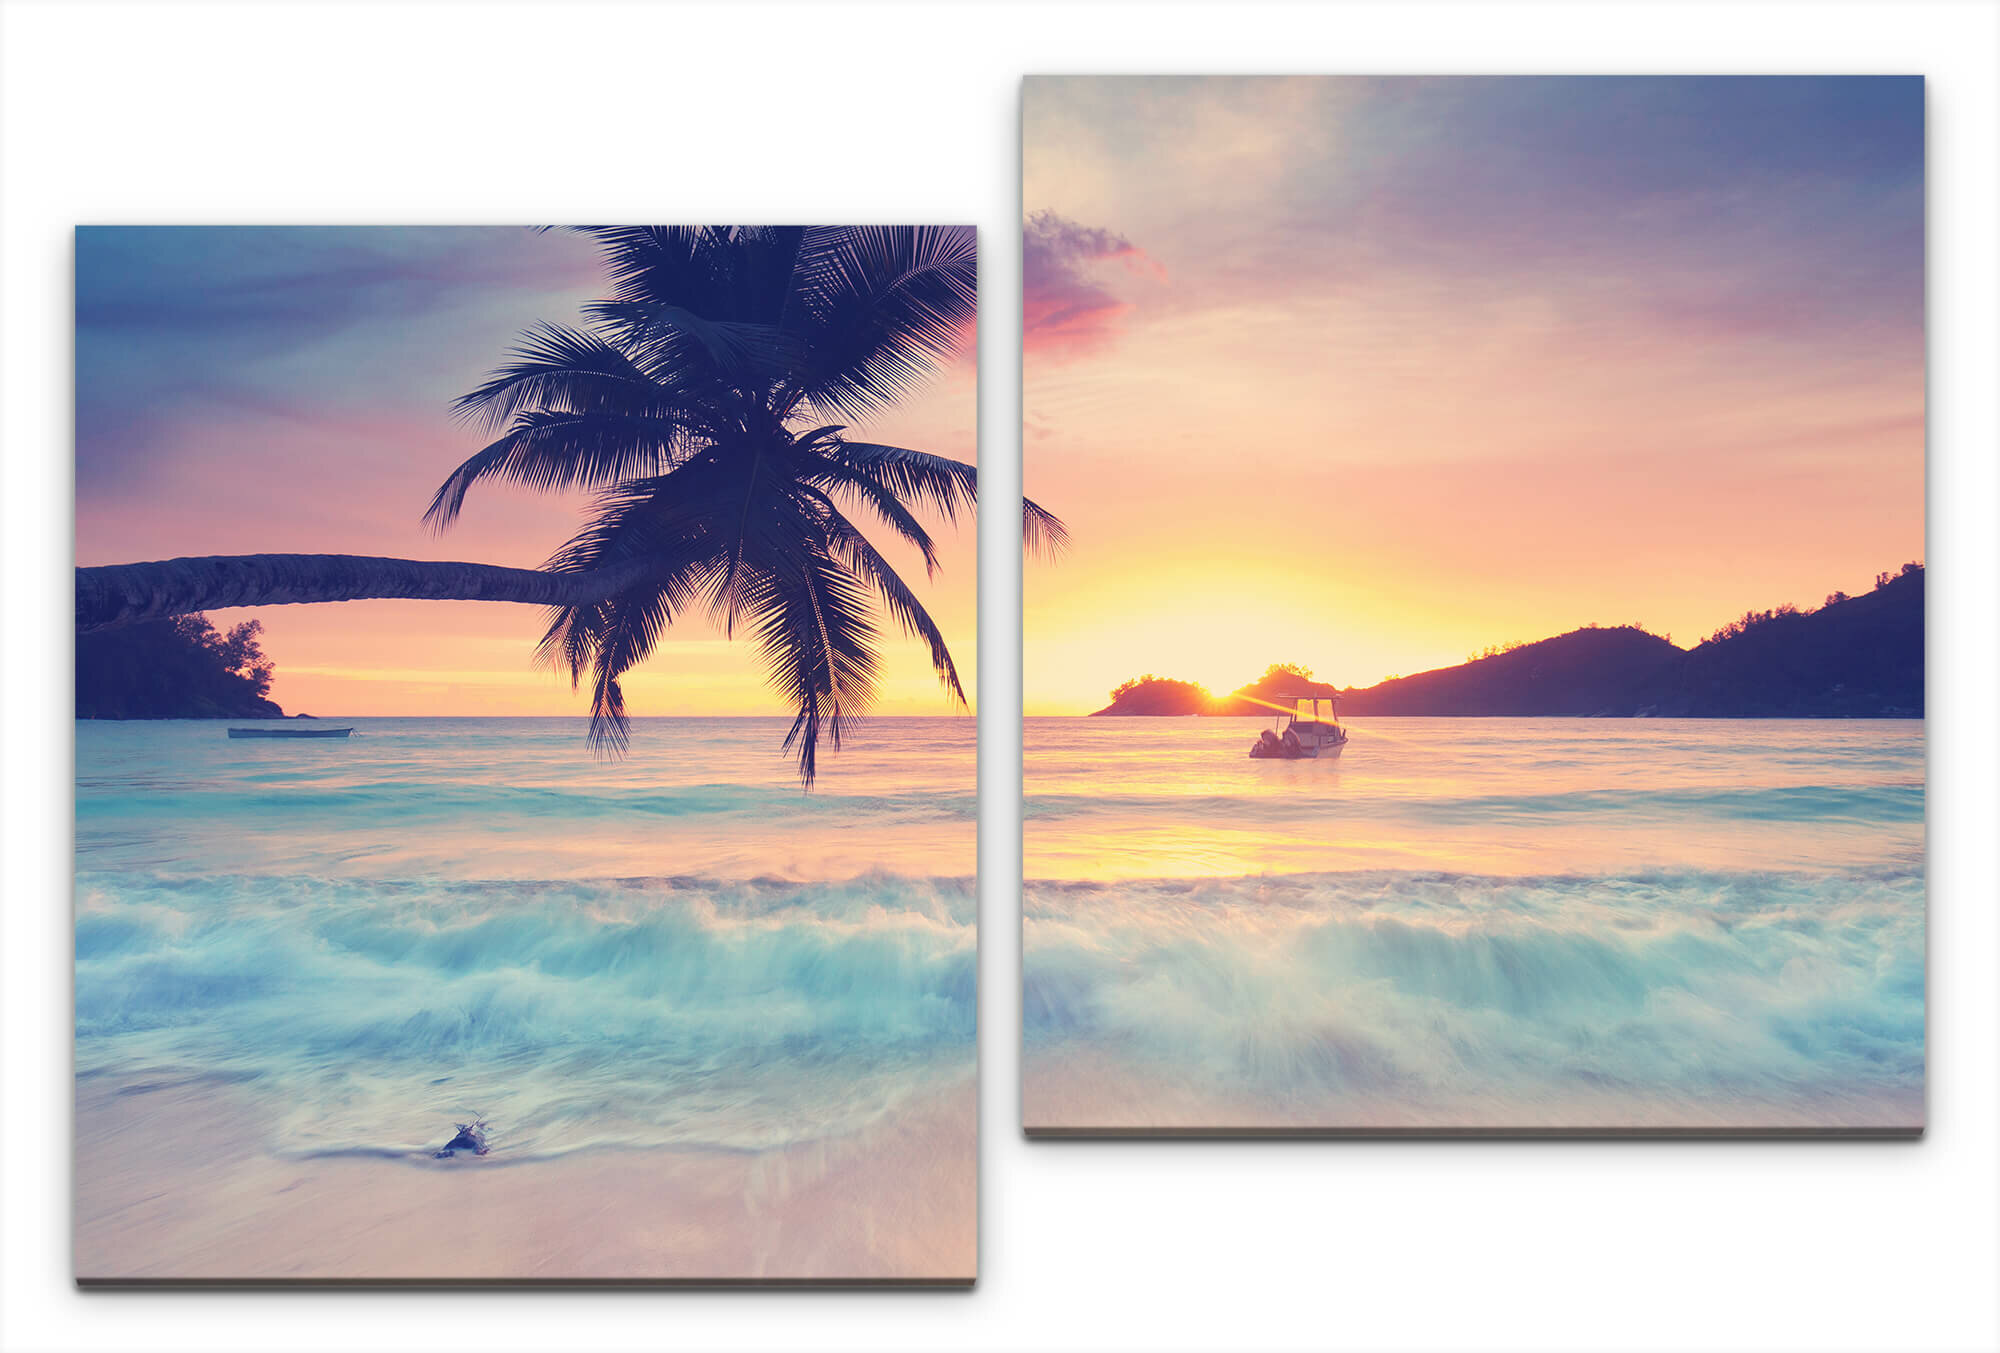 East Urban Home Seychelles 2 Piece Photographic Art Print Set On Wrapped Canvas Wayfair Co Uk